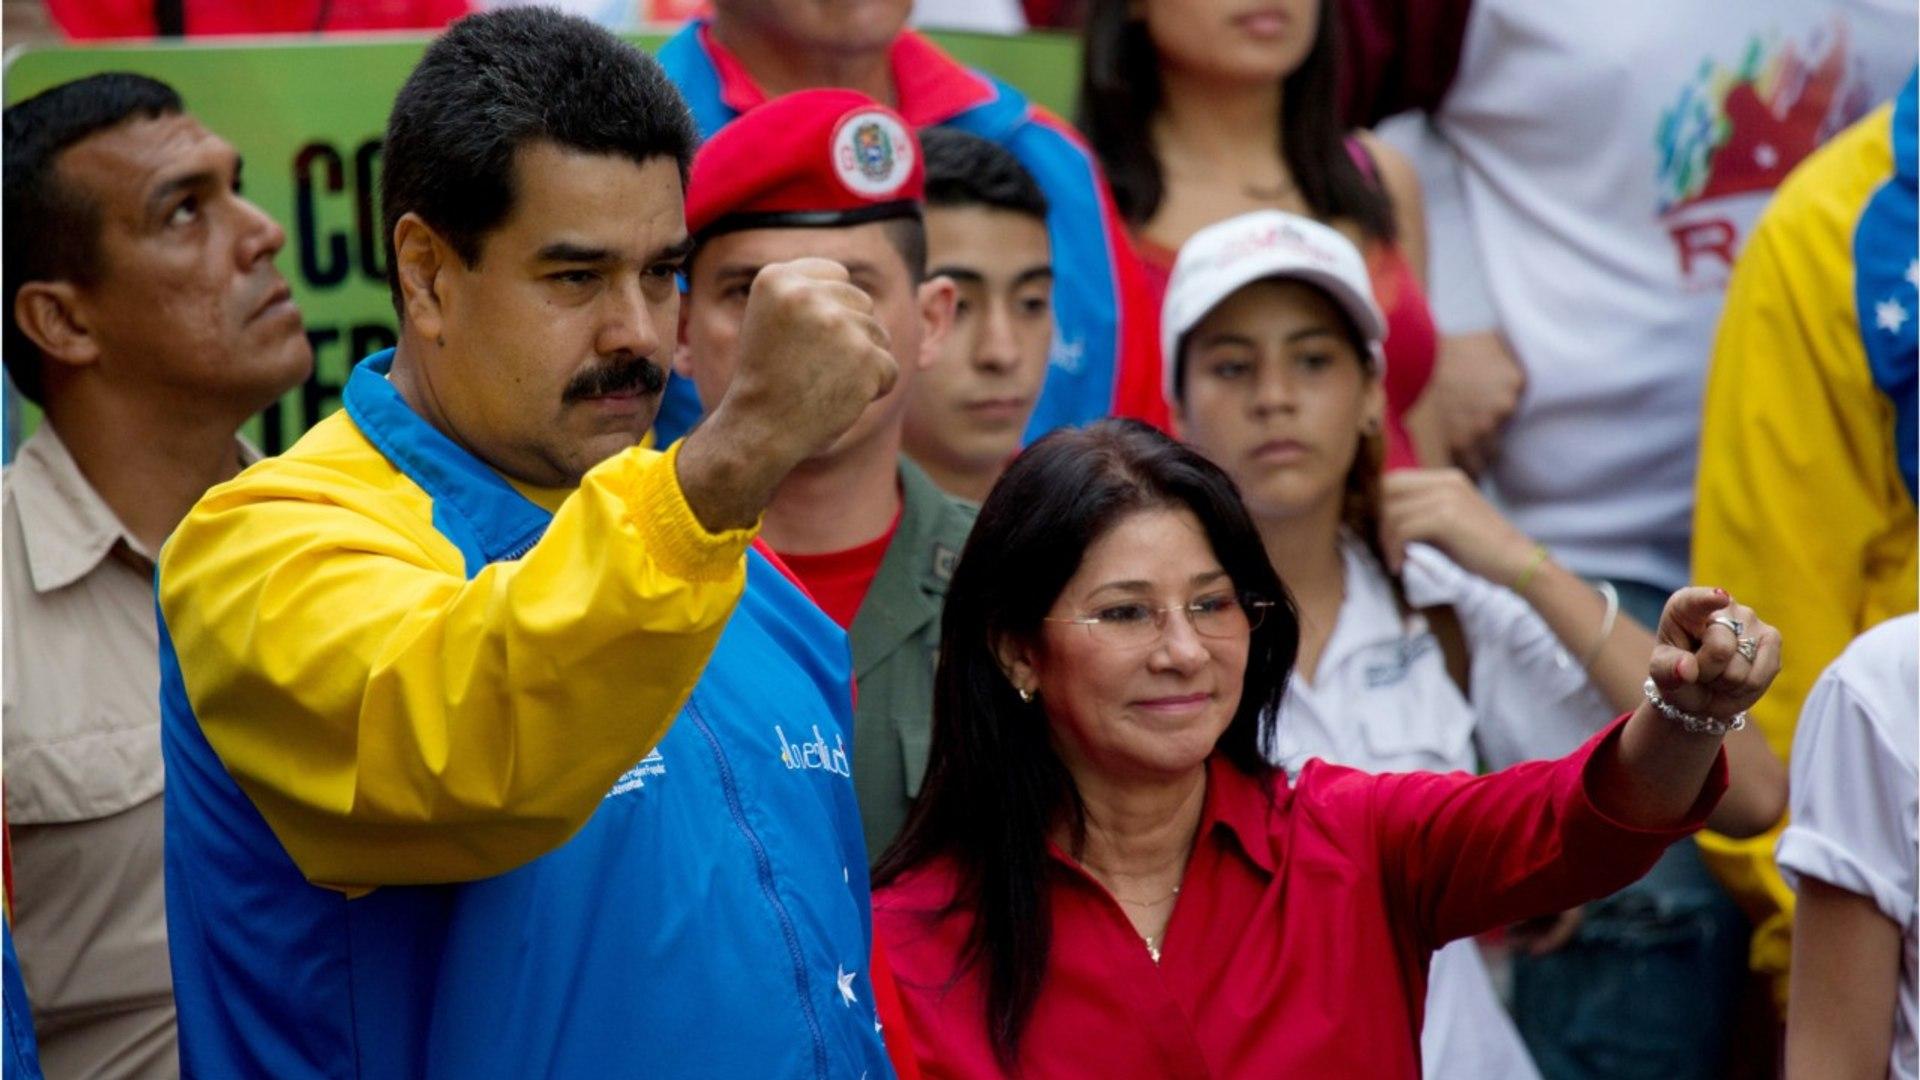 Nephews of Venezuela's First Lady Sentenced to 18 Years